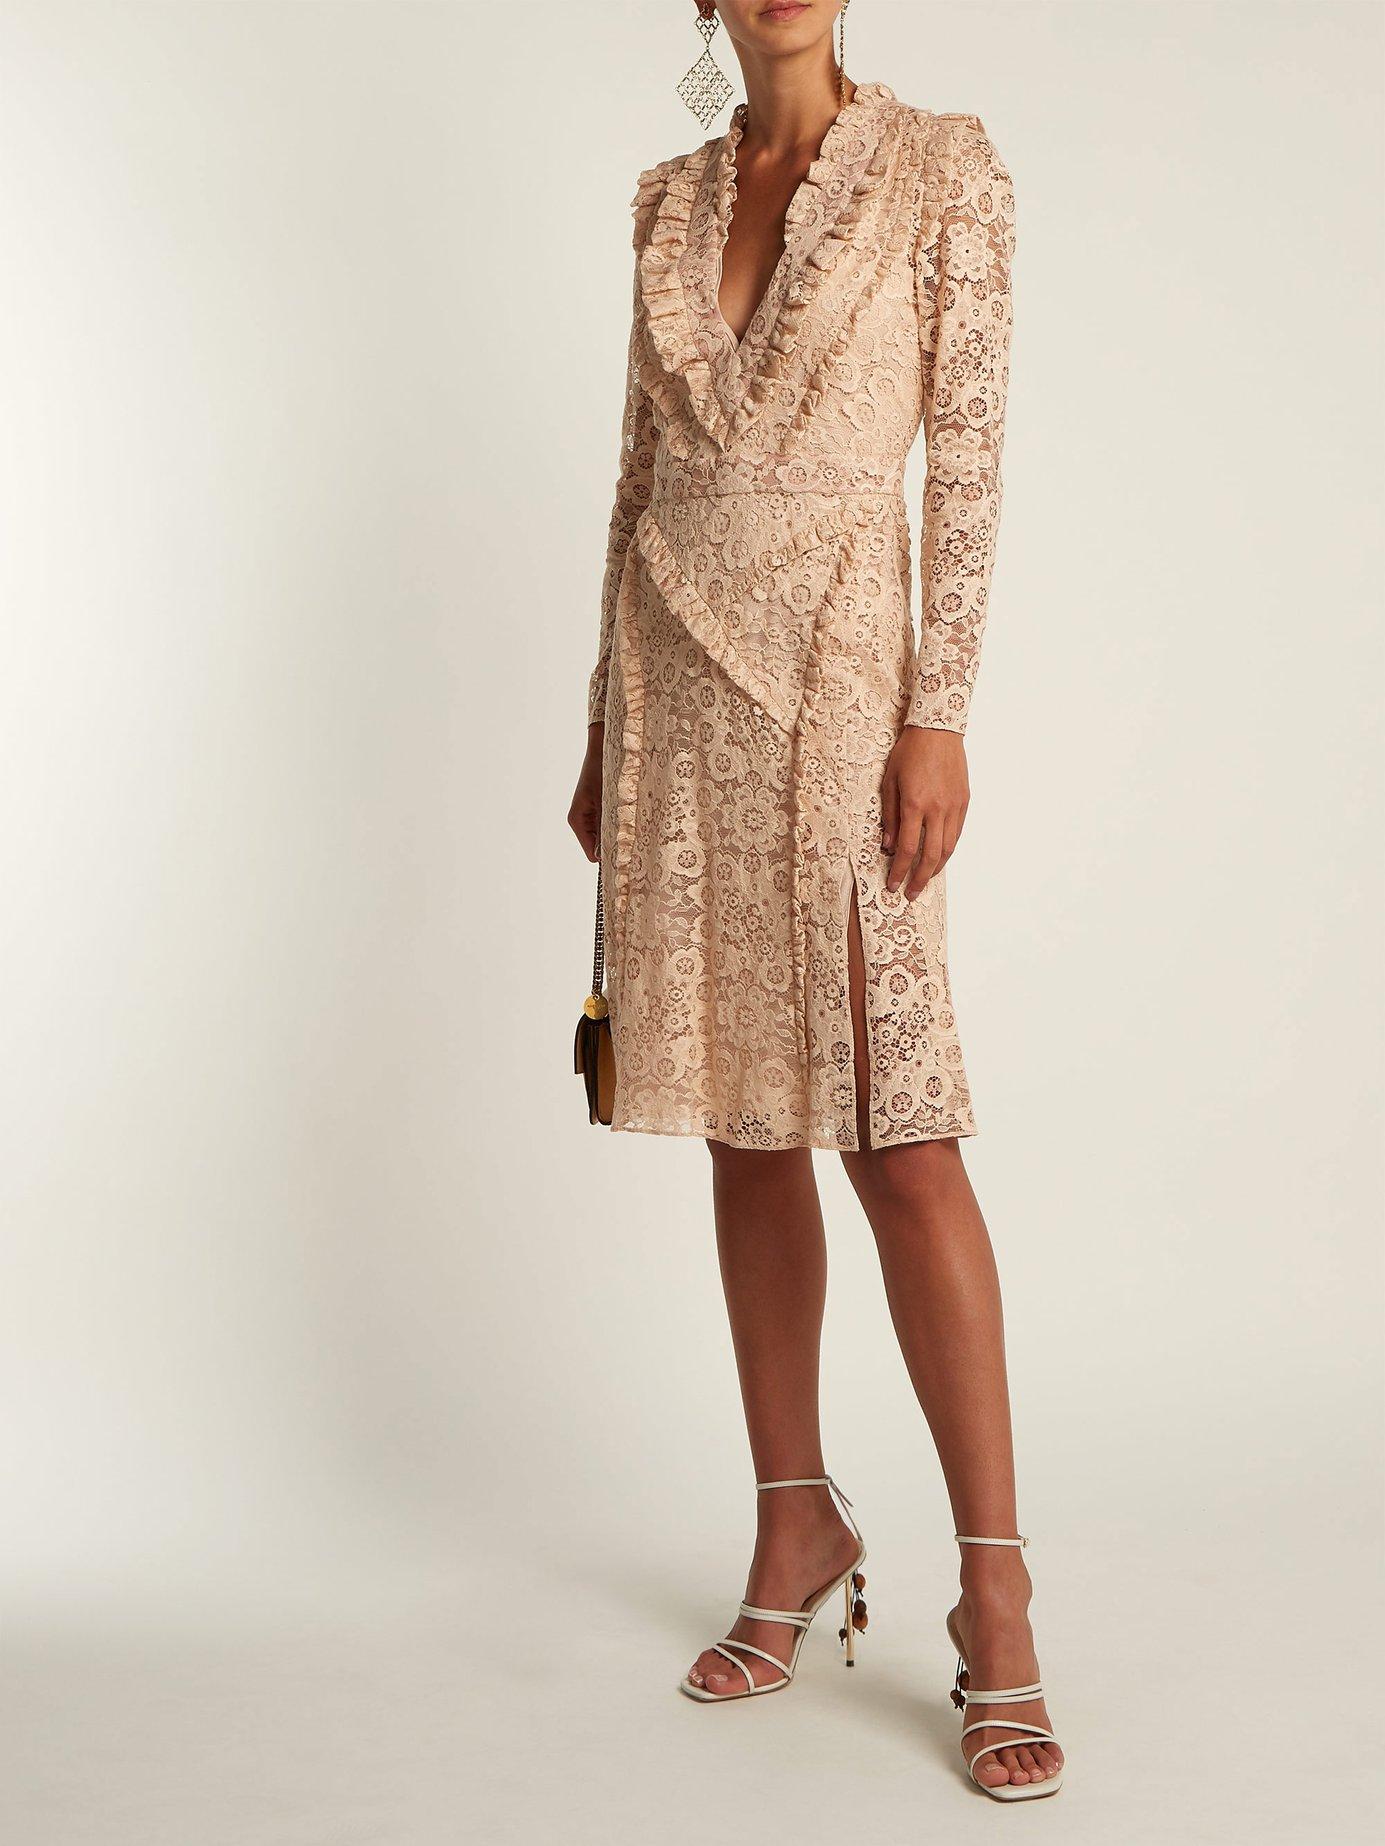 Ourika Valencienne-lace dress by Altuzarra